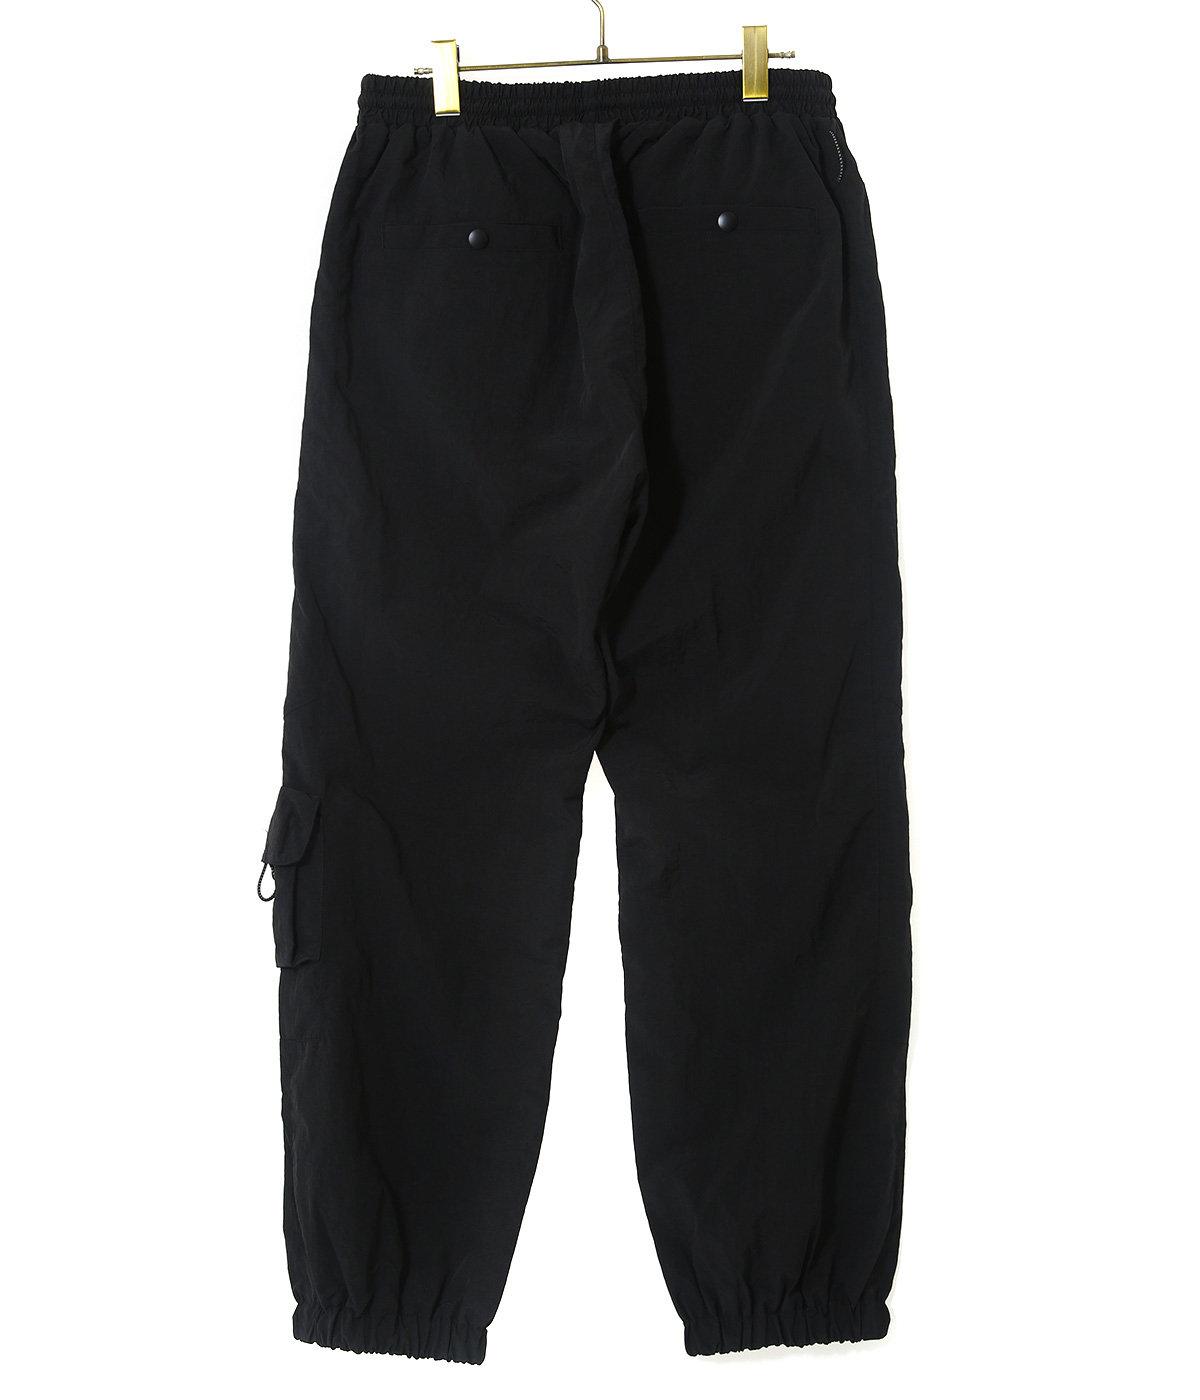 CLASSIC NYLON PANTS